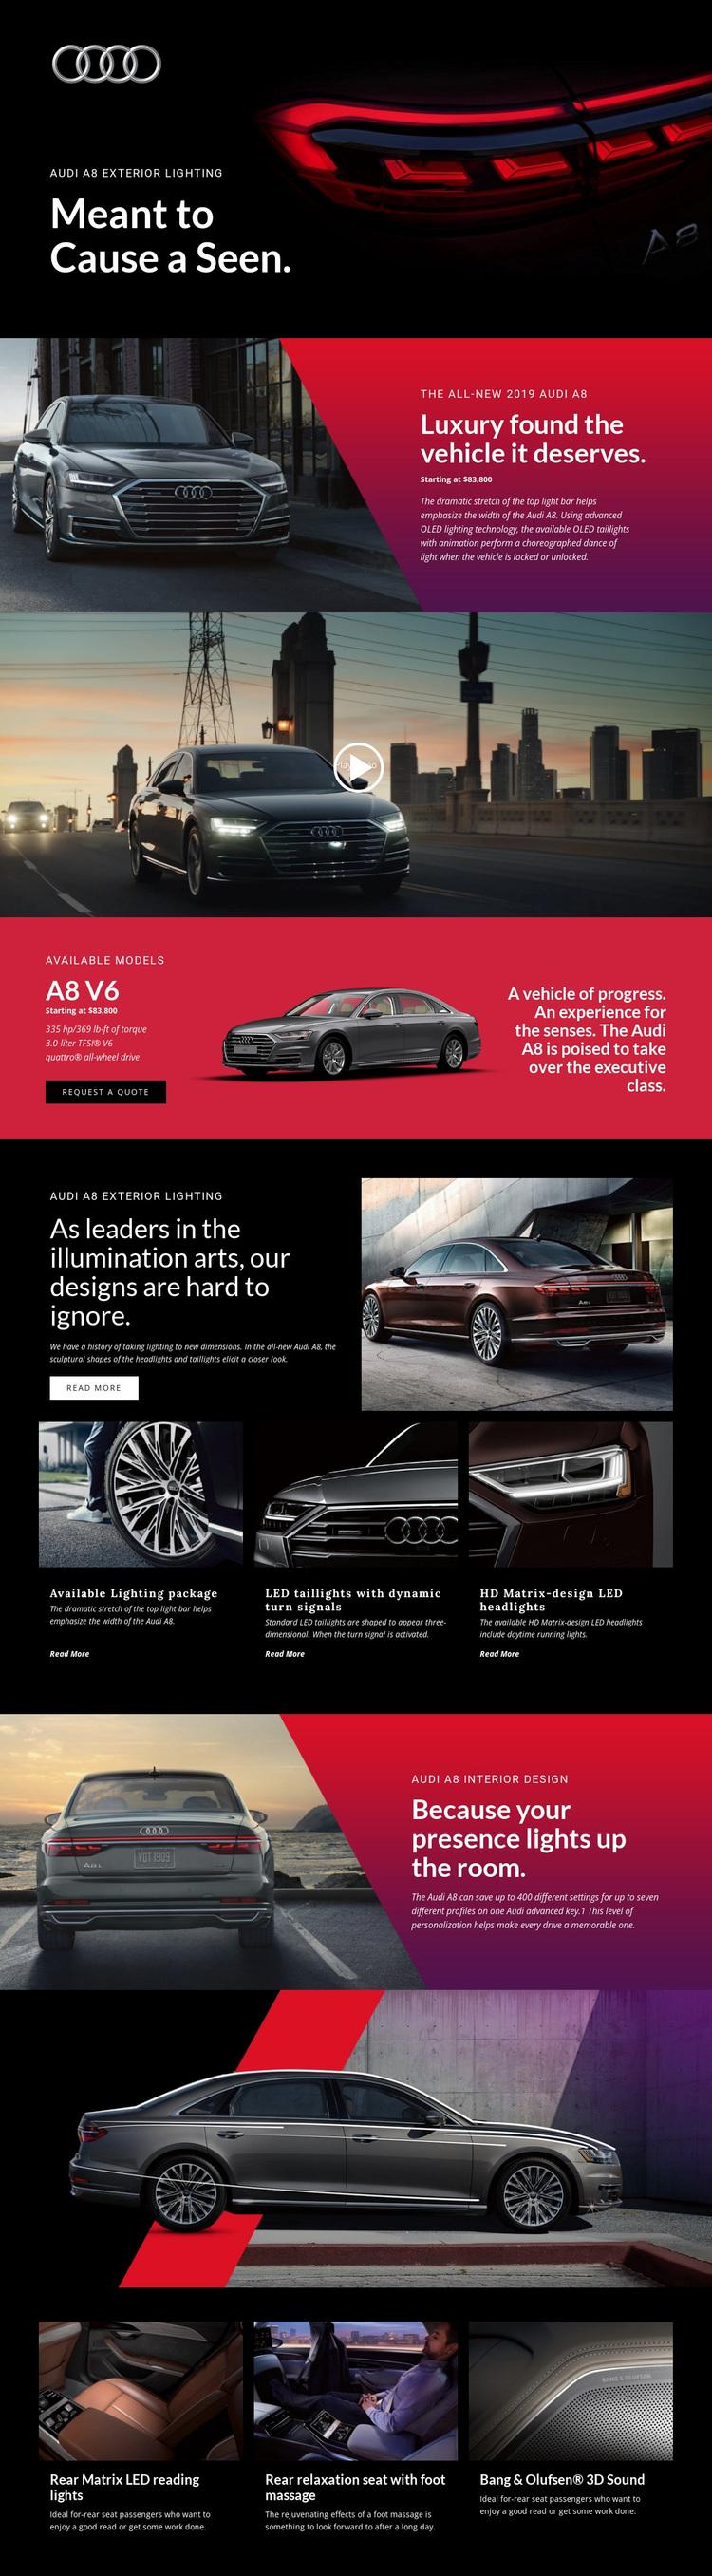 Audi luxury cars Template